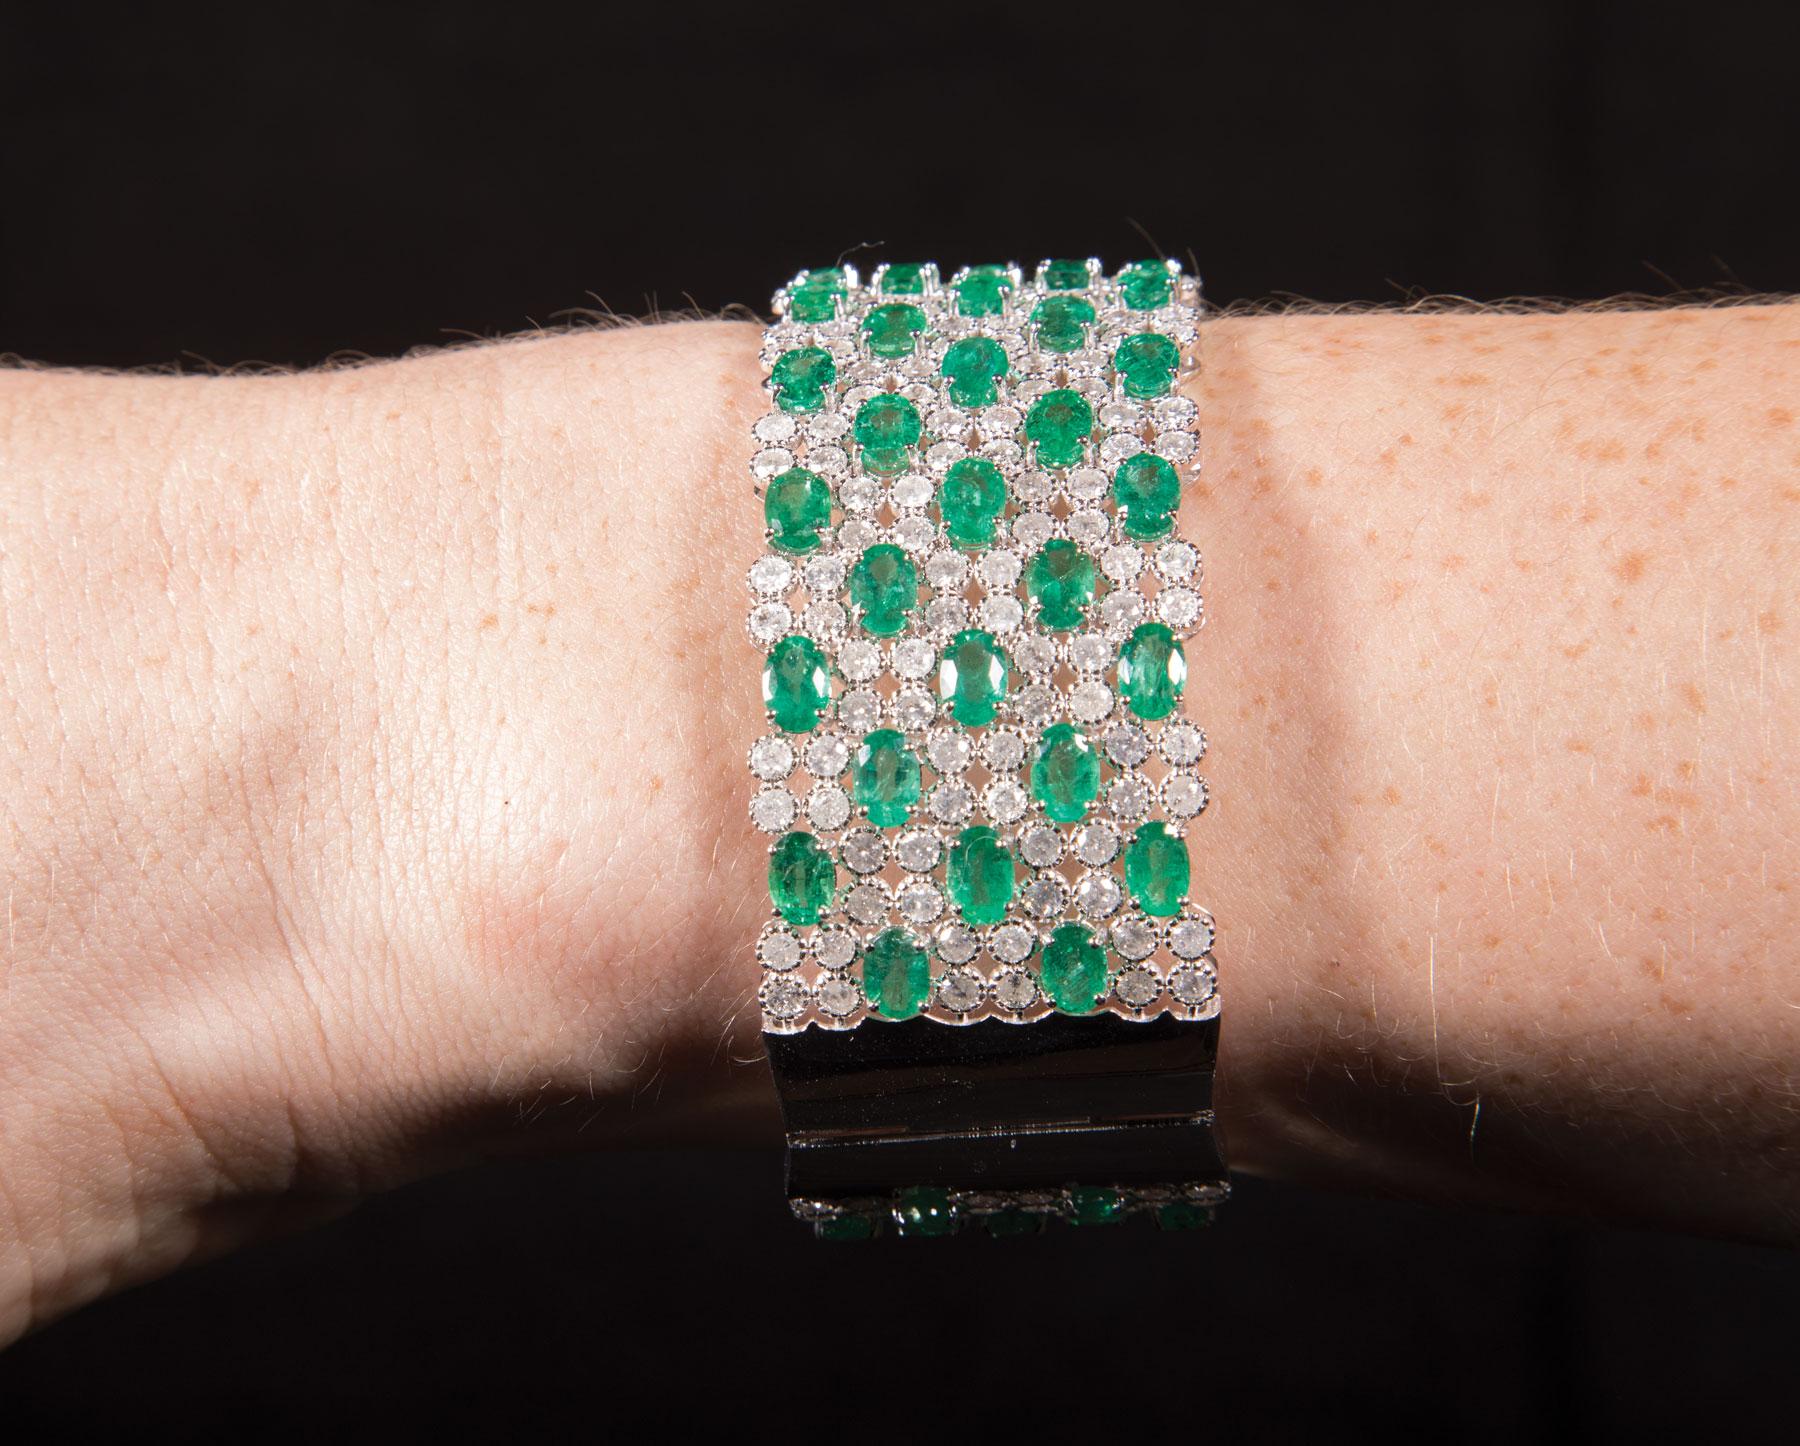 Lot 578 - 18 kt. White Gold, Diamond and Emerald Cuff/Bangle Bracelet , 264 bezel set round brilliant cut